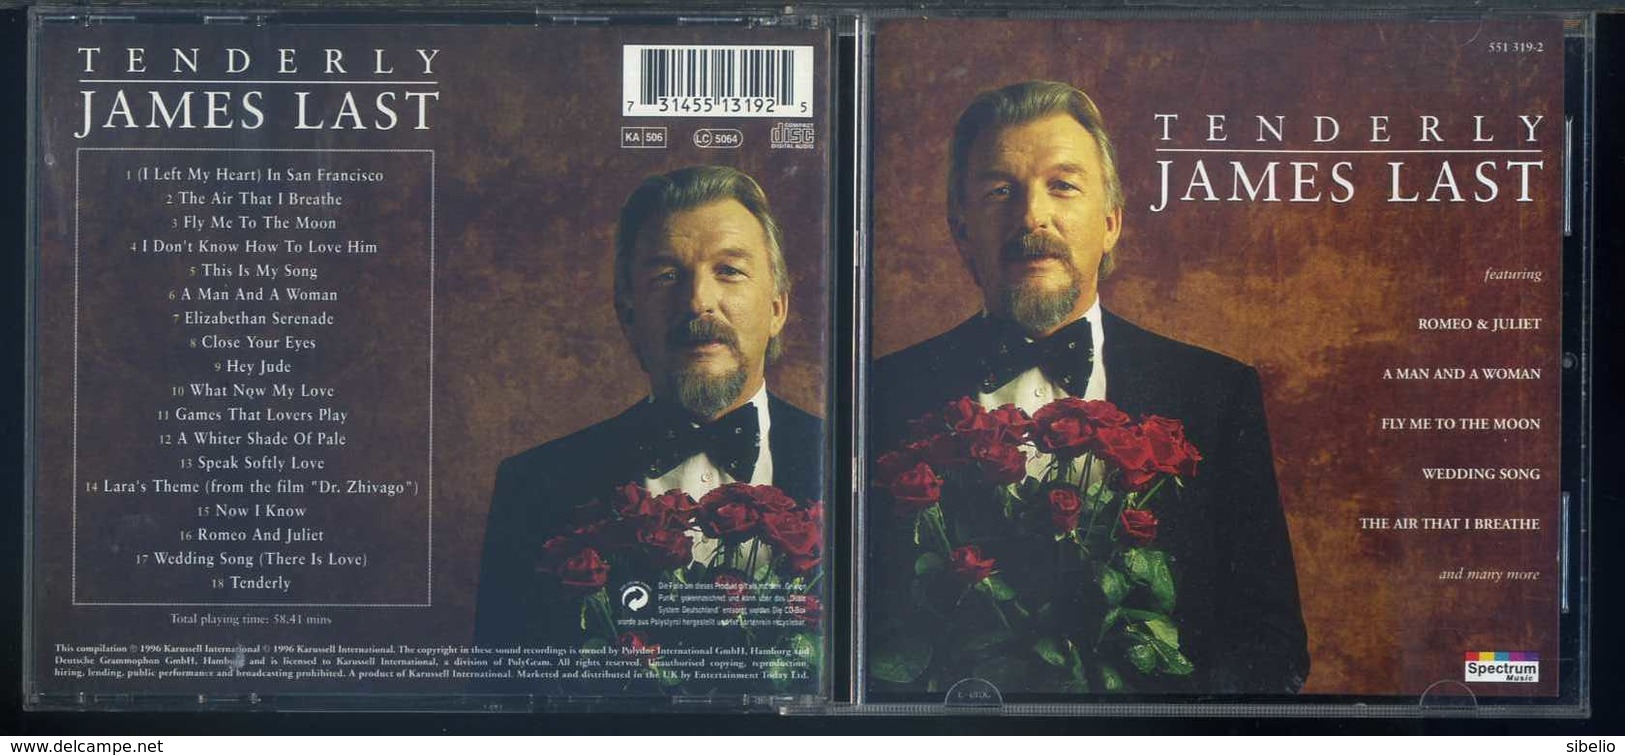 James Last - Tenderly - 1CD - Sonstige